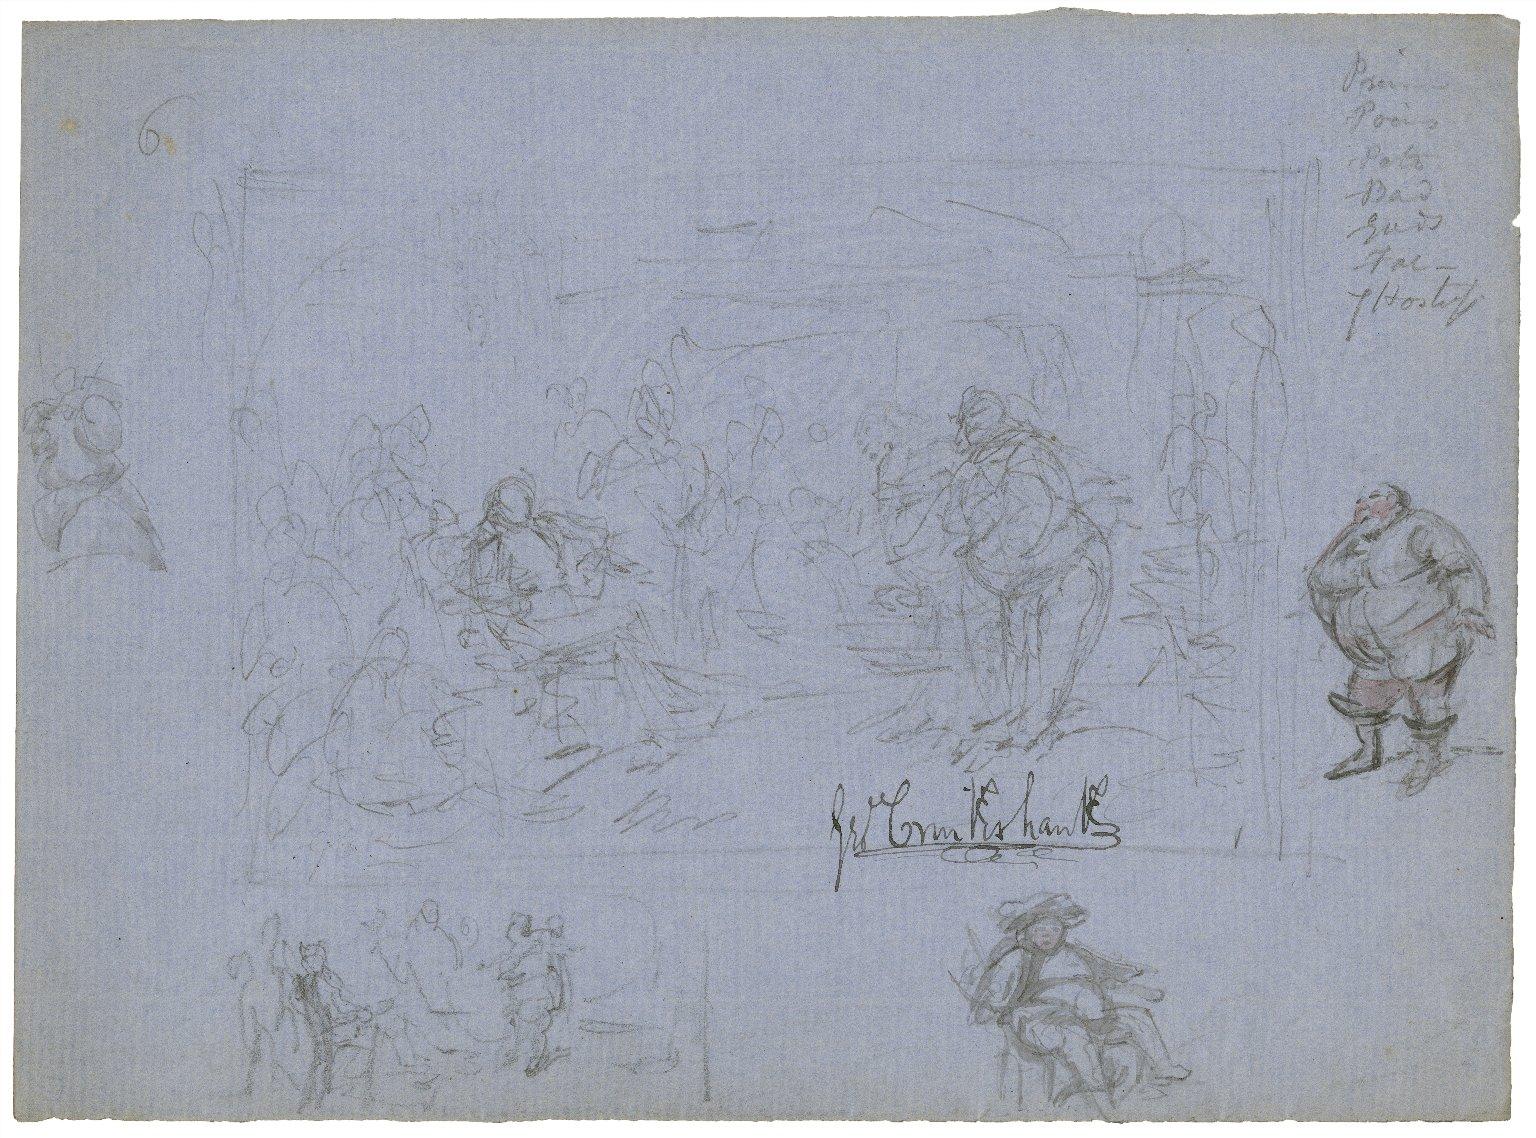 [Falstaff sketches, King Henry IV, pt. 1, act II, scene 4] [graphic] / Geo. Cruikshank.